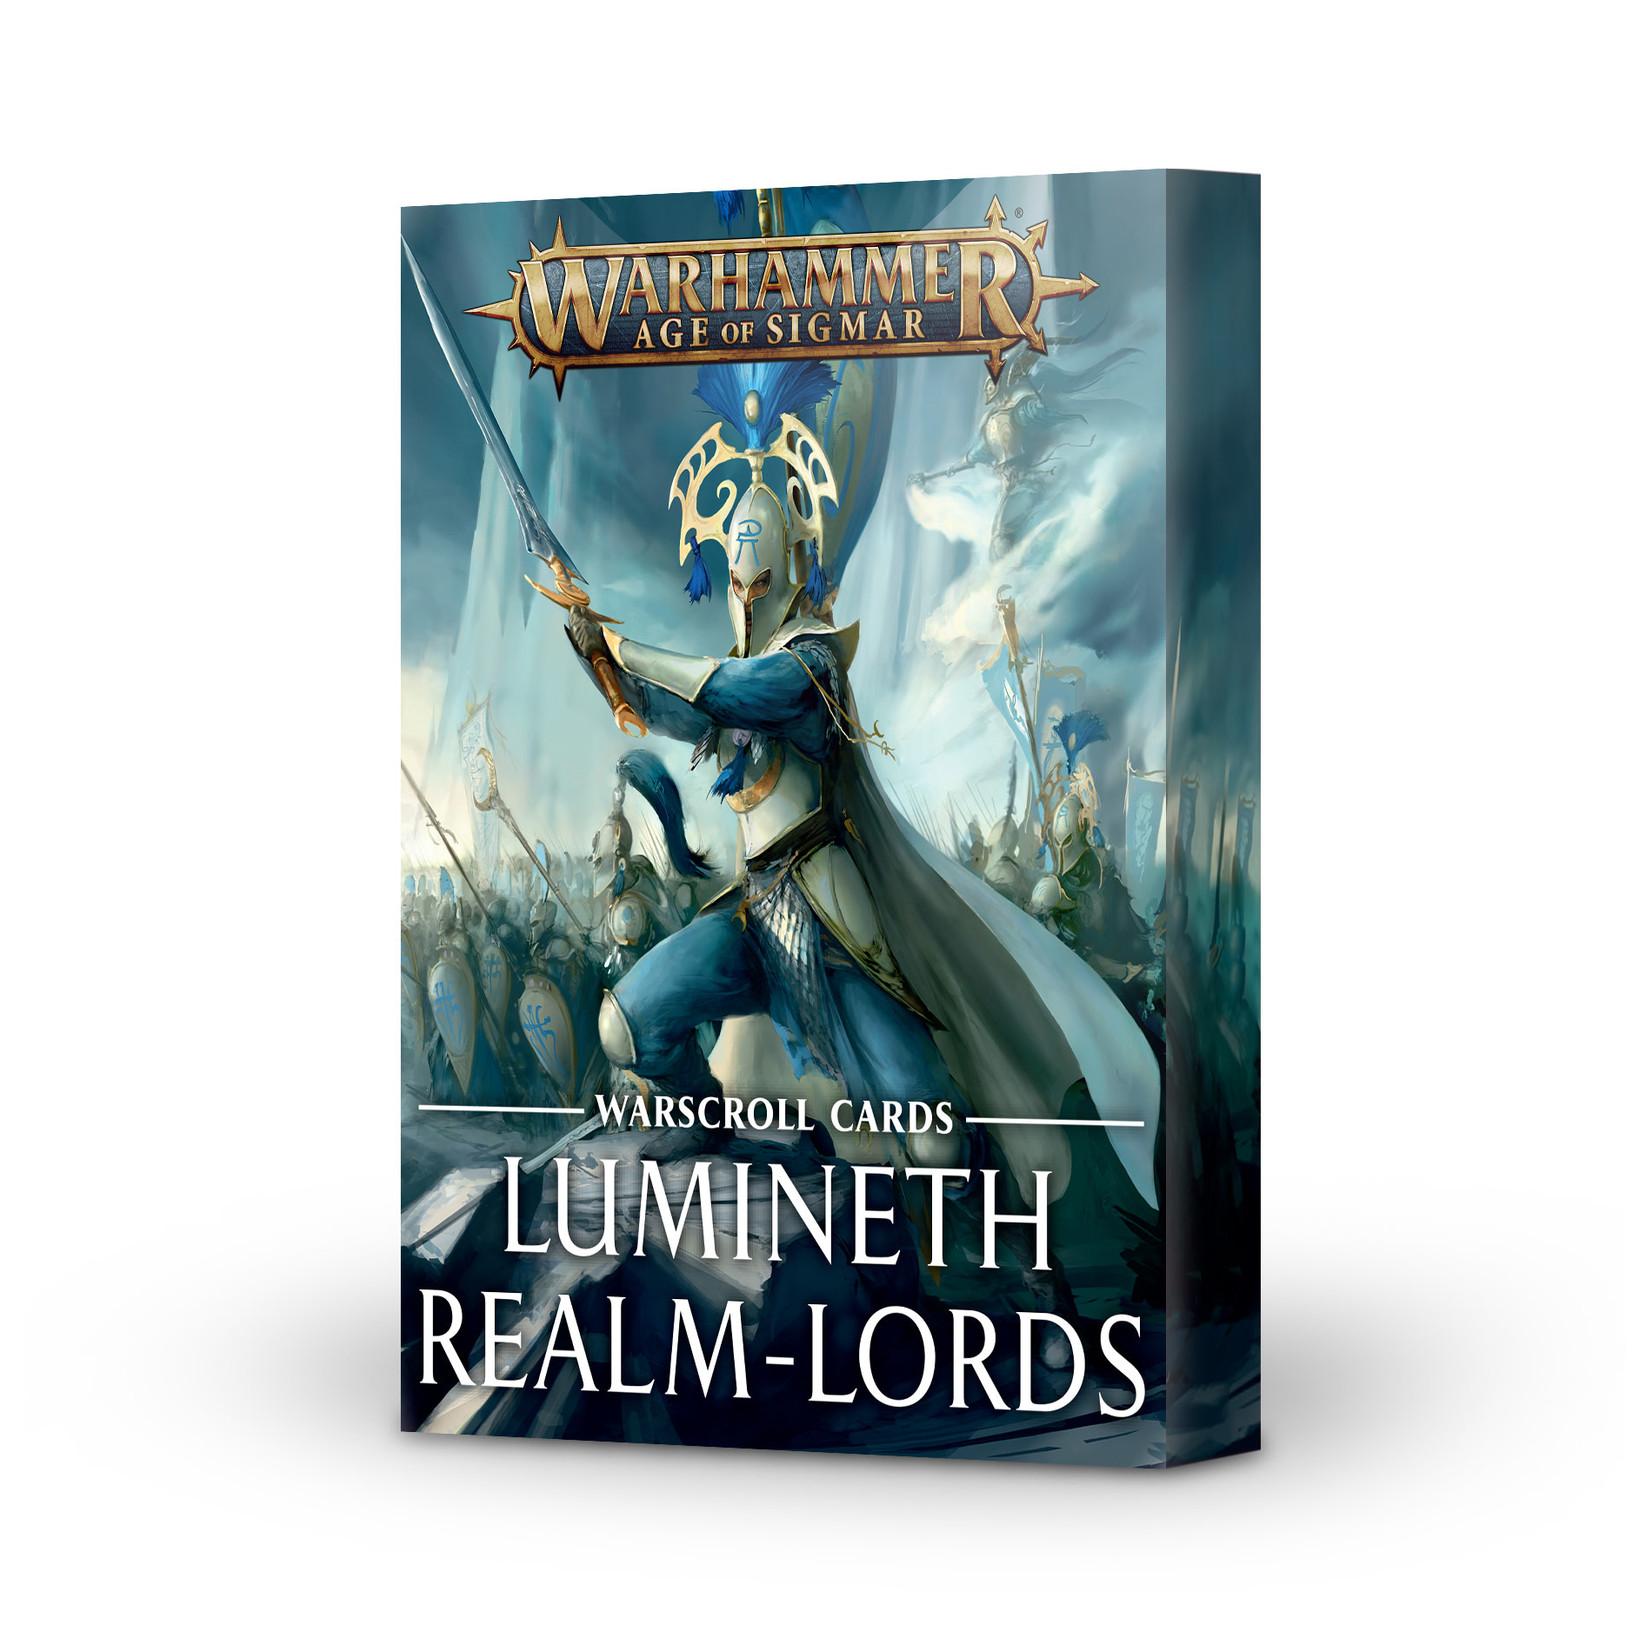 Games Workshop Warhammer Age of Sigmar: Lumineth Realm-Lords - Warscroll Cards